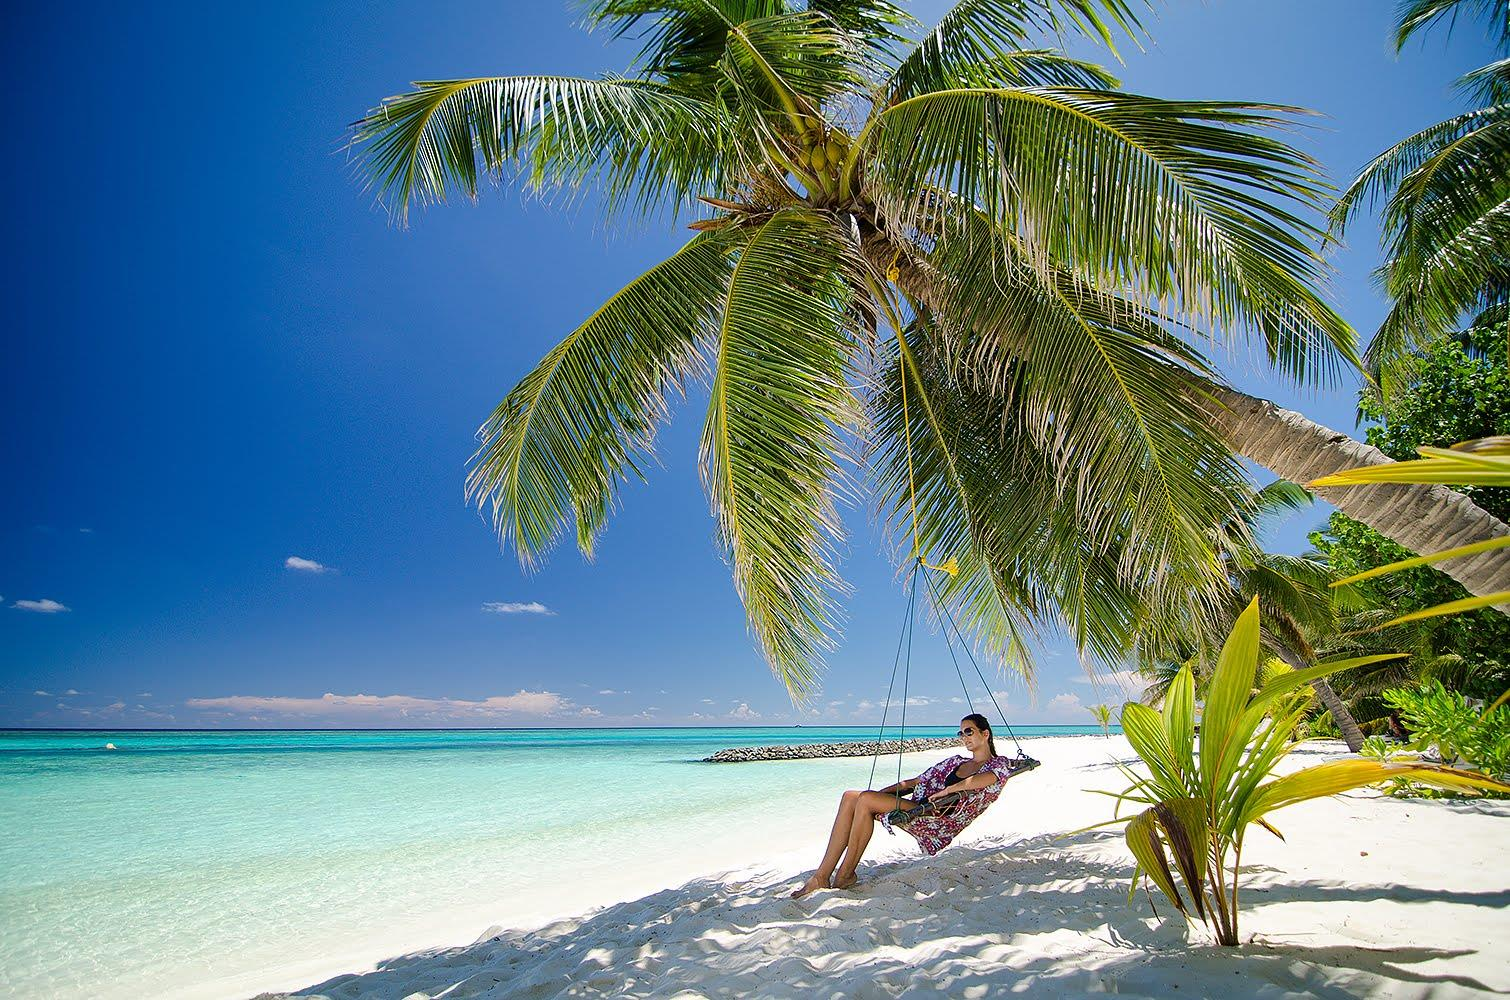 summer-island-maldives-genel-0021